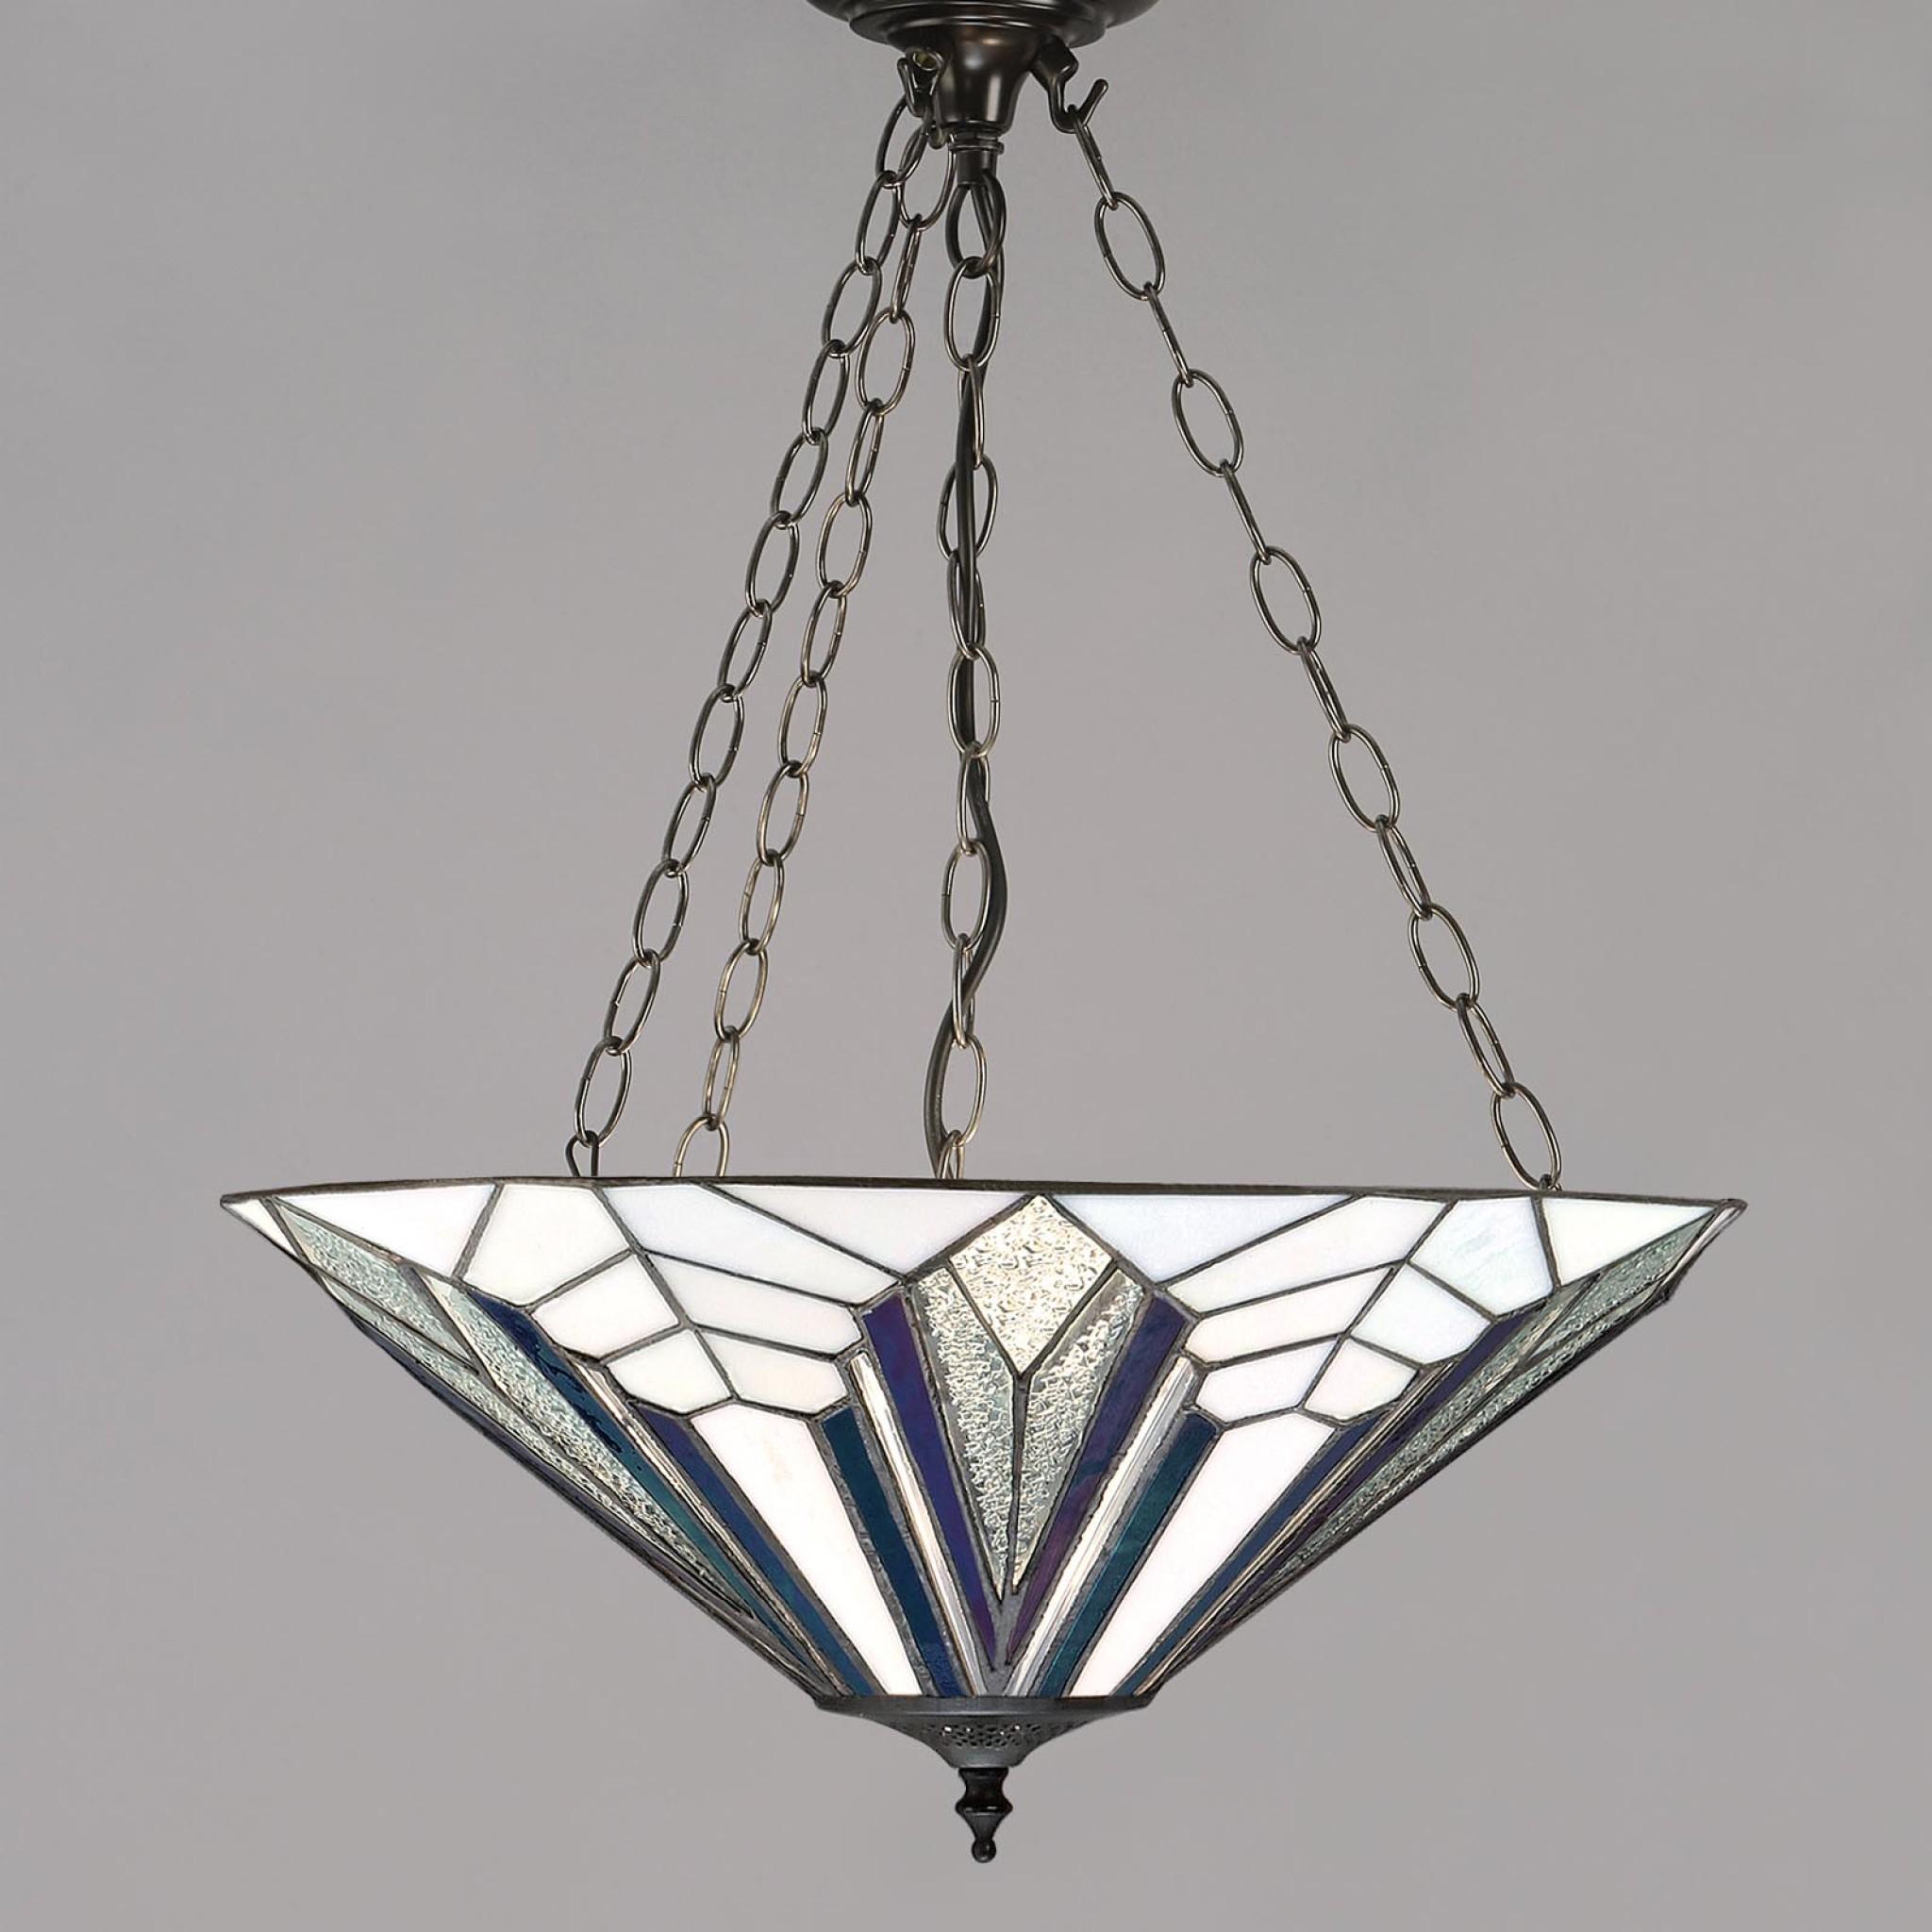 Astoria Large Inverted Pendant Interiors 1900 Tiffany Lighting